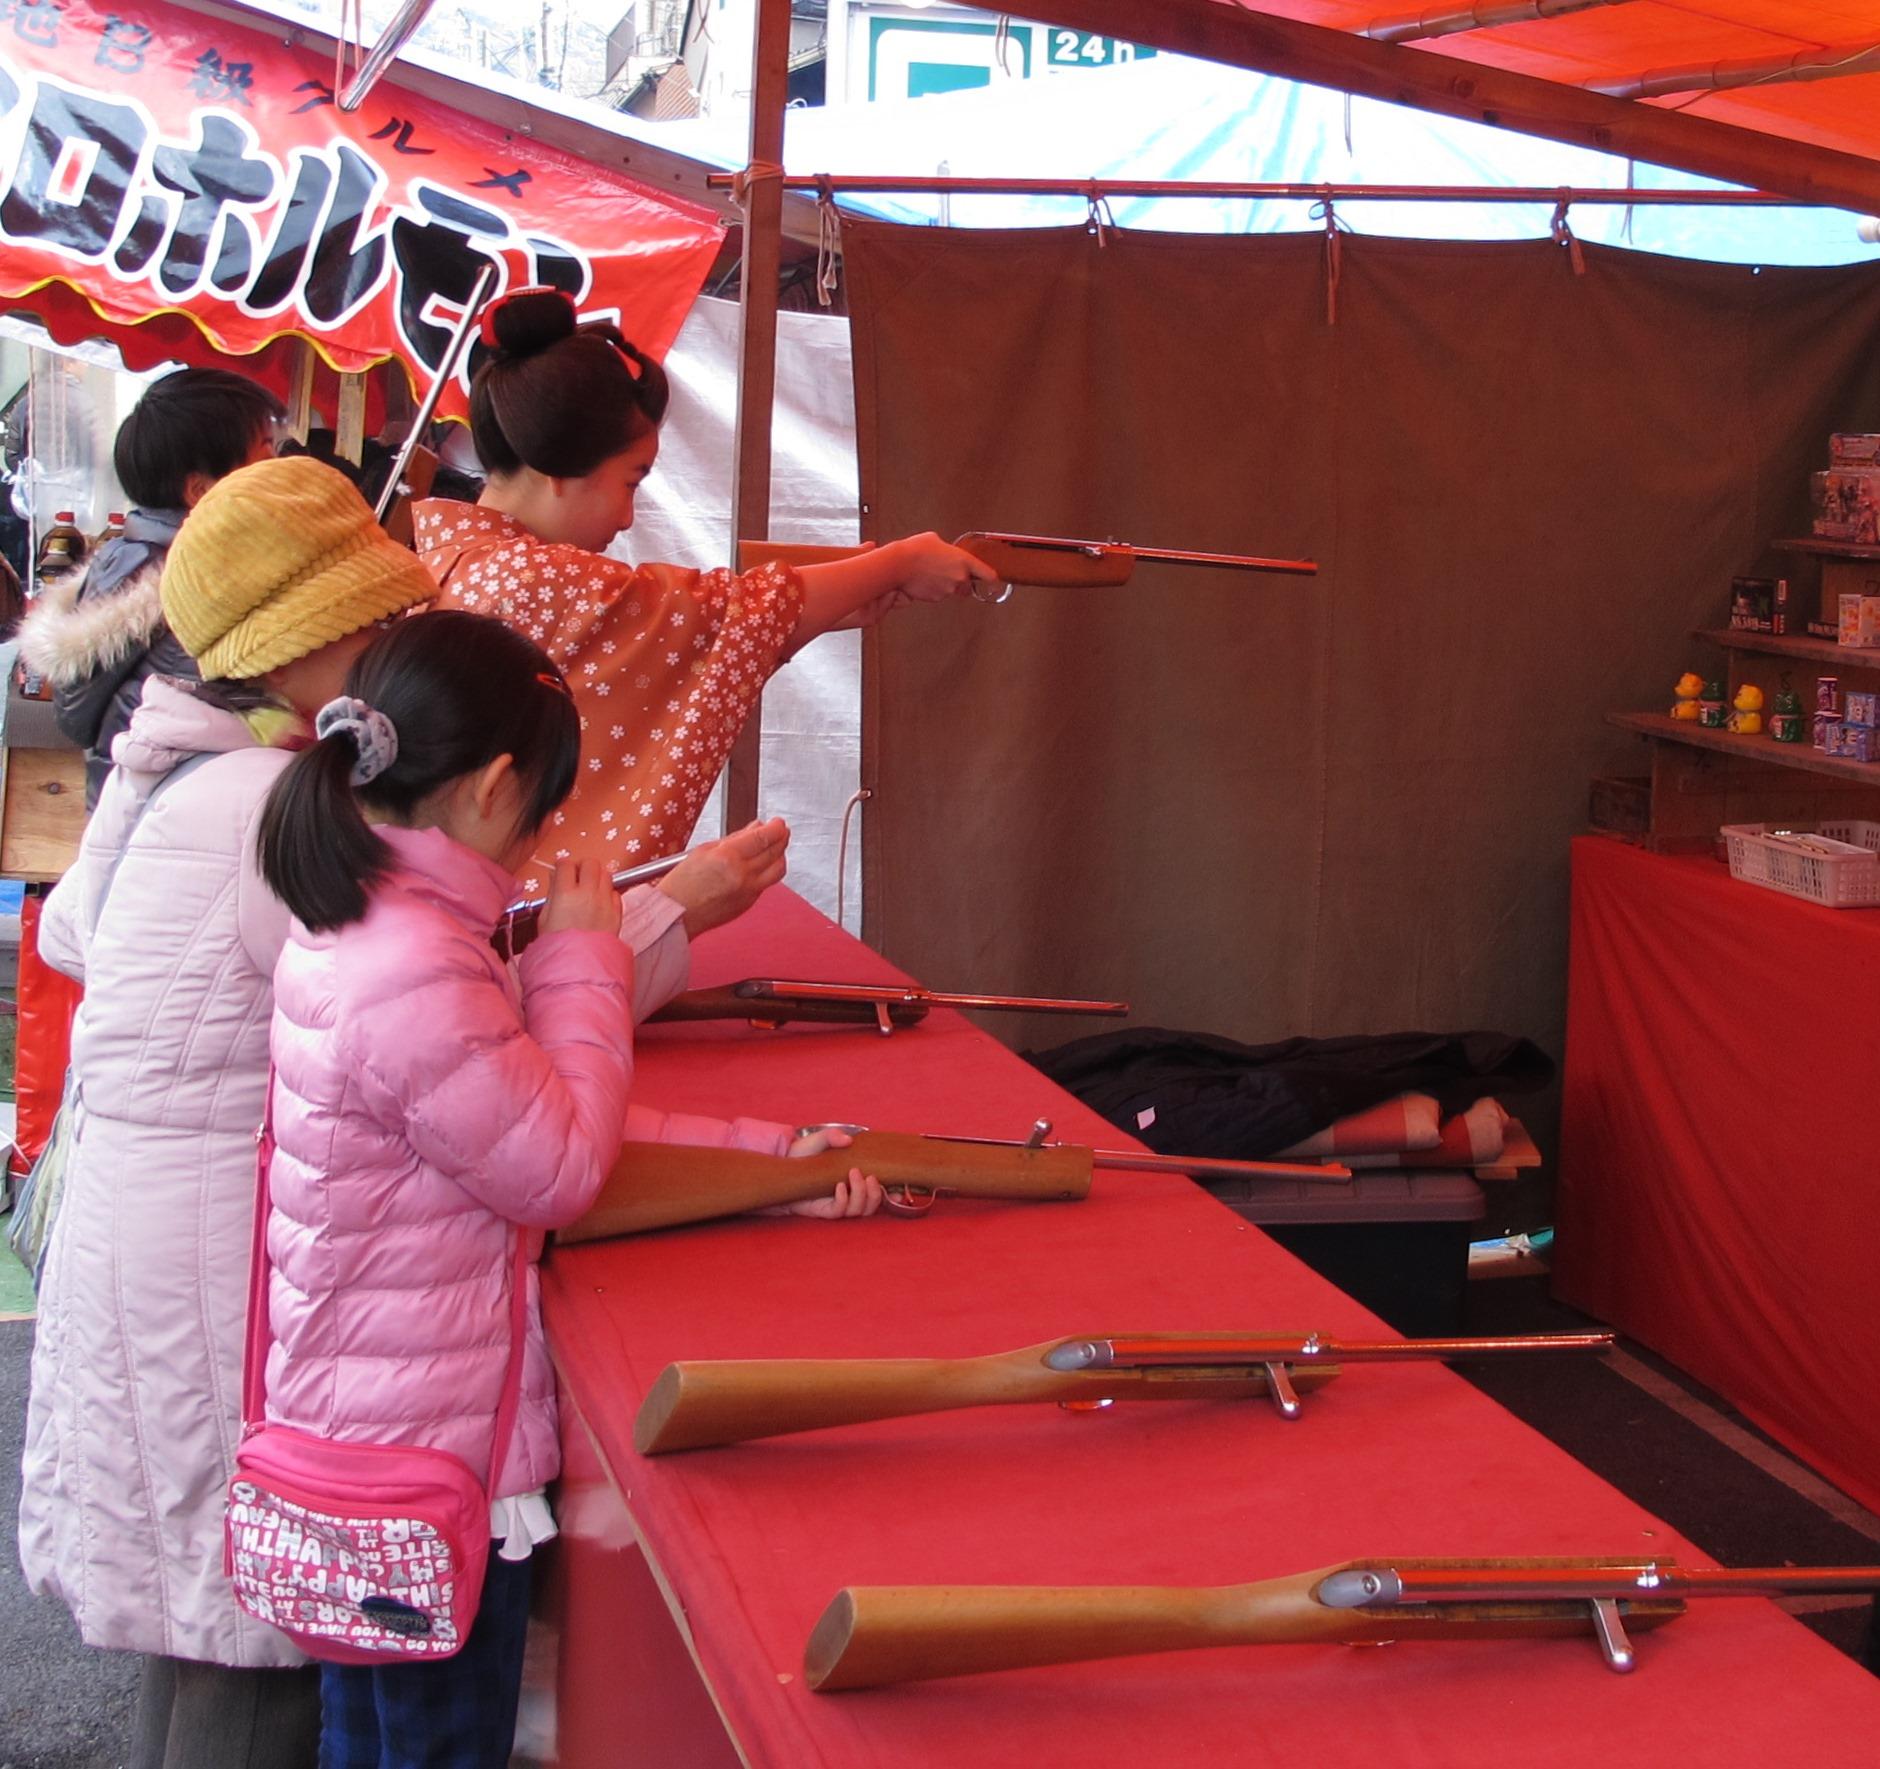 A shooting range among the stalls. Can you see the maiko?